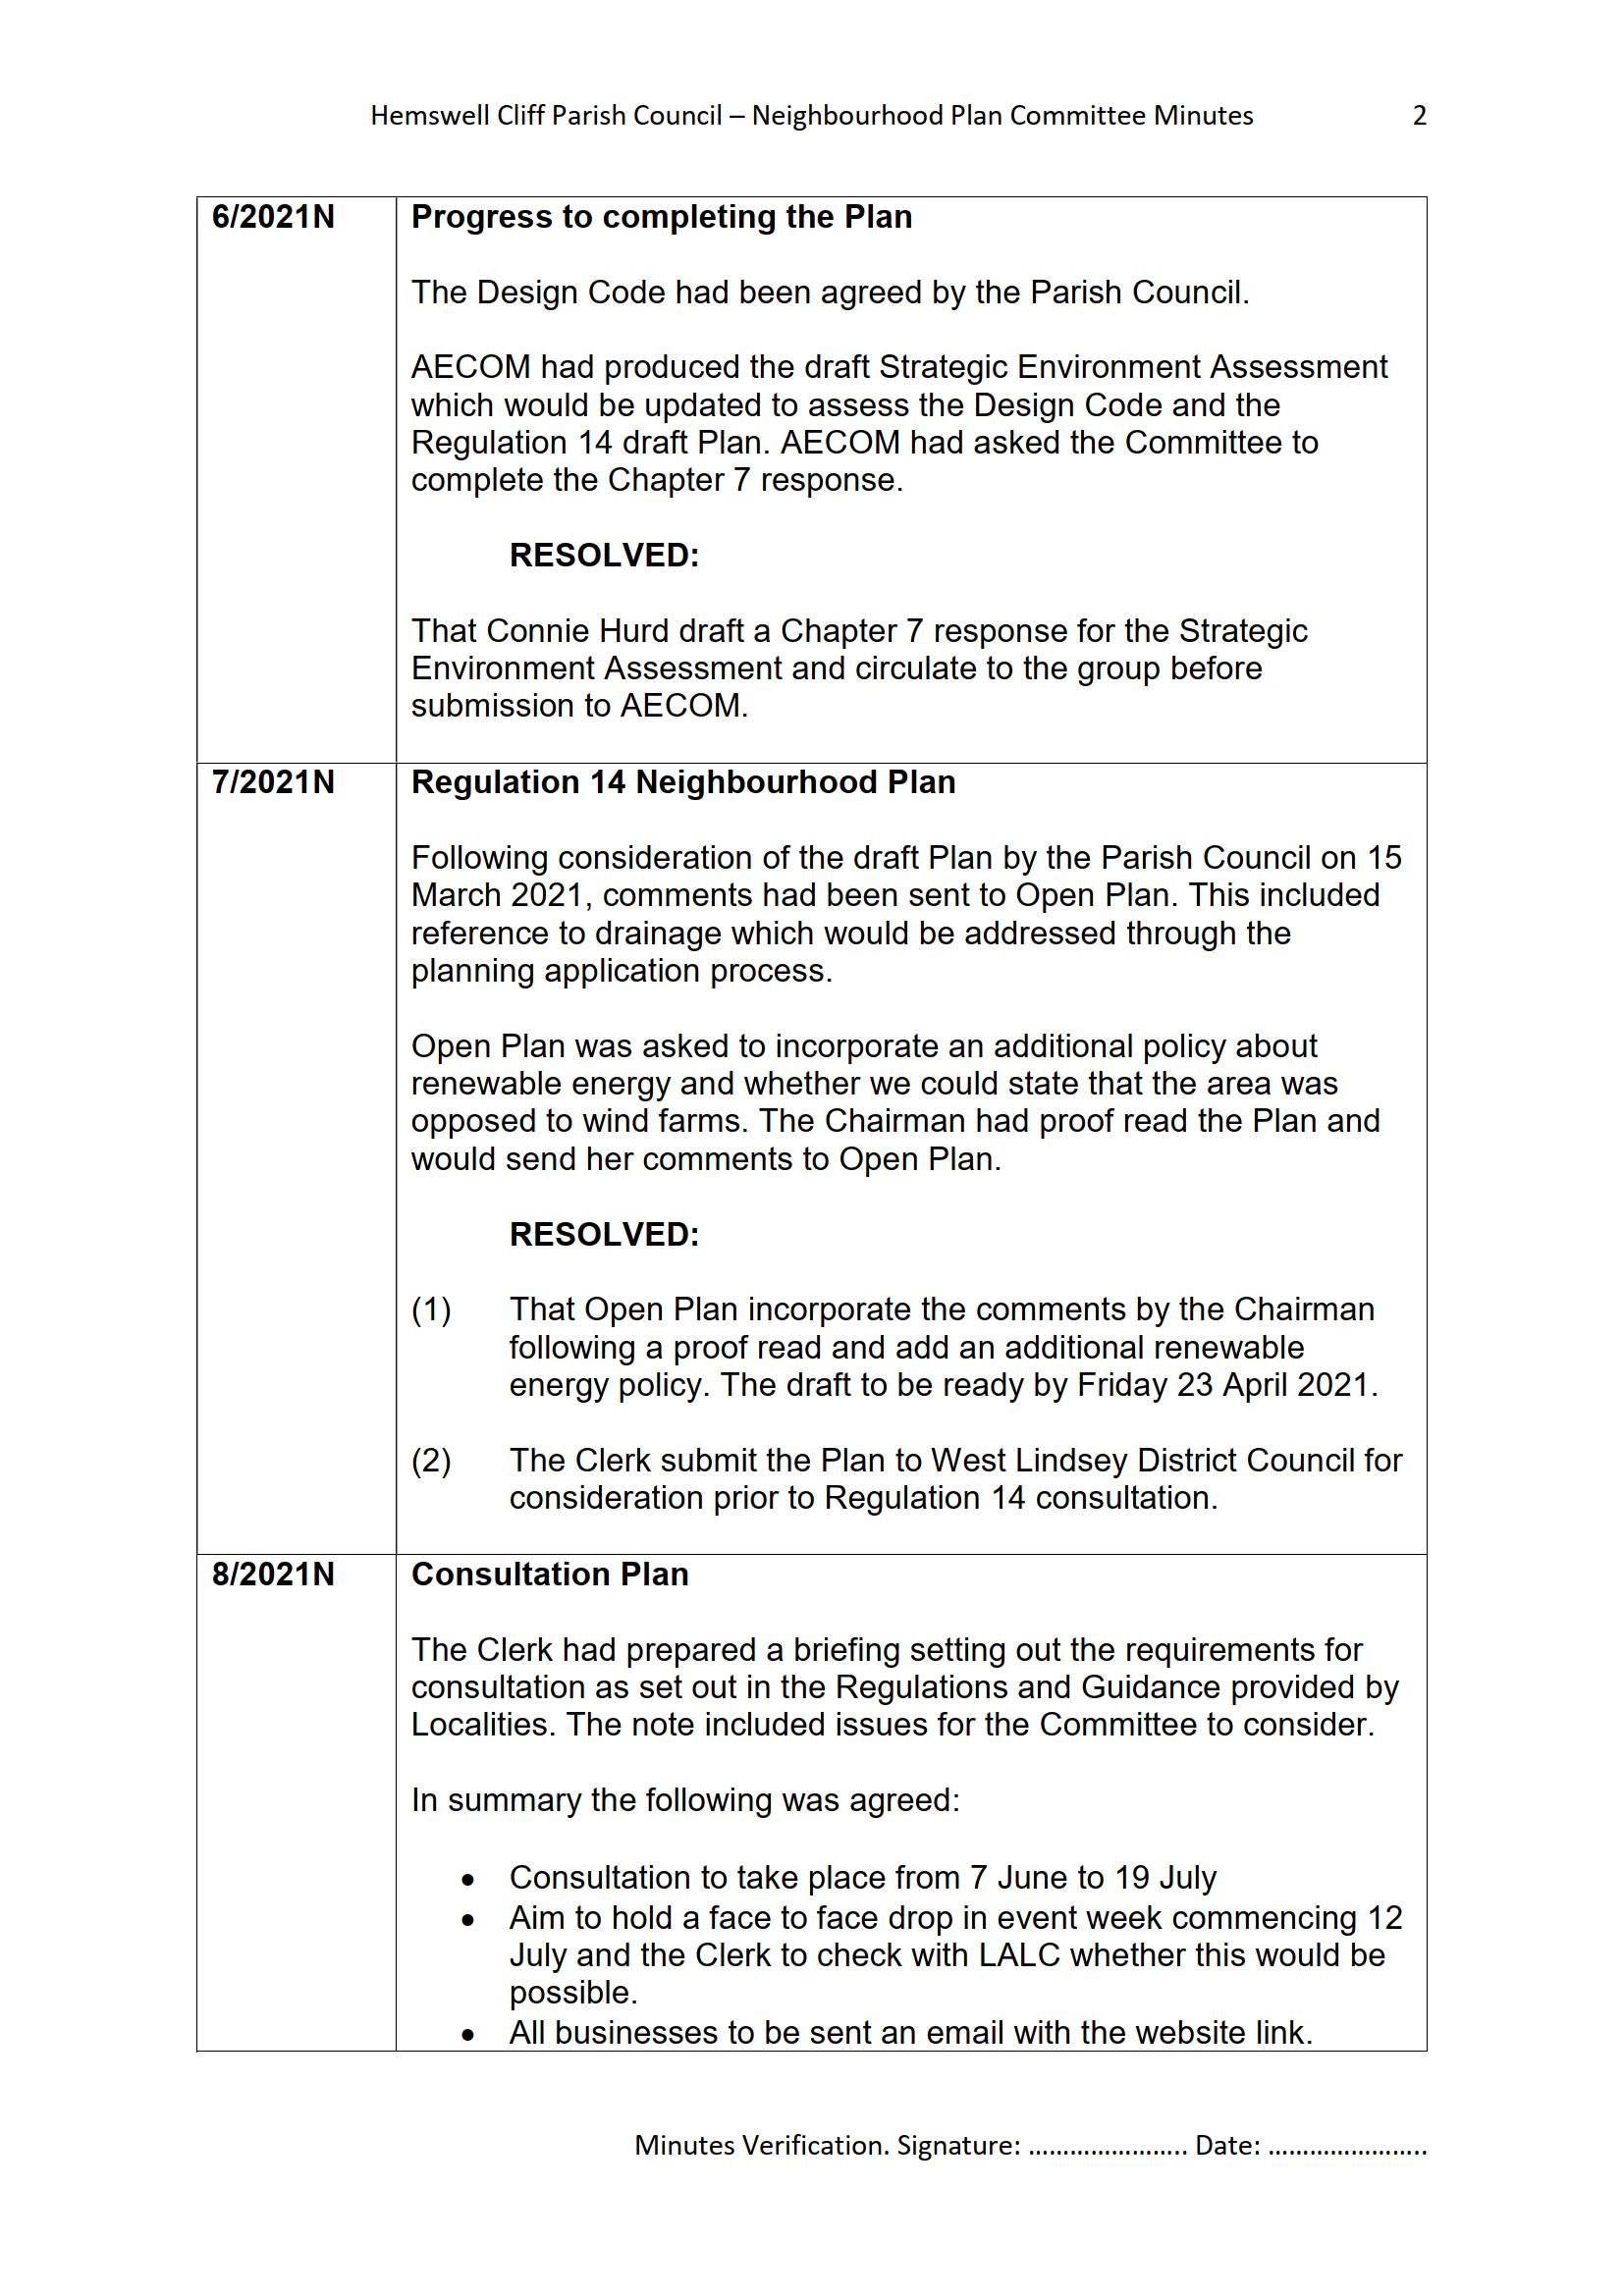 HCPC_NPC_Minutes_12.04.21_2.png